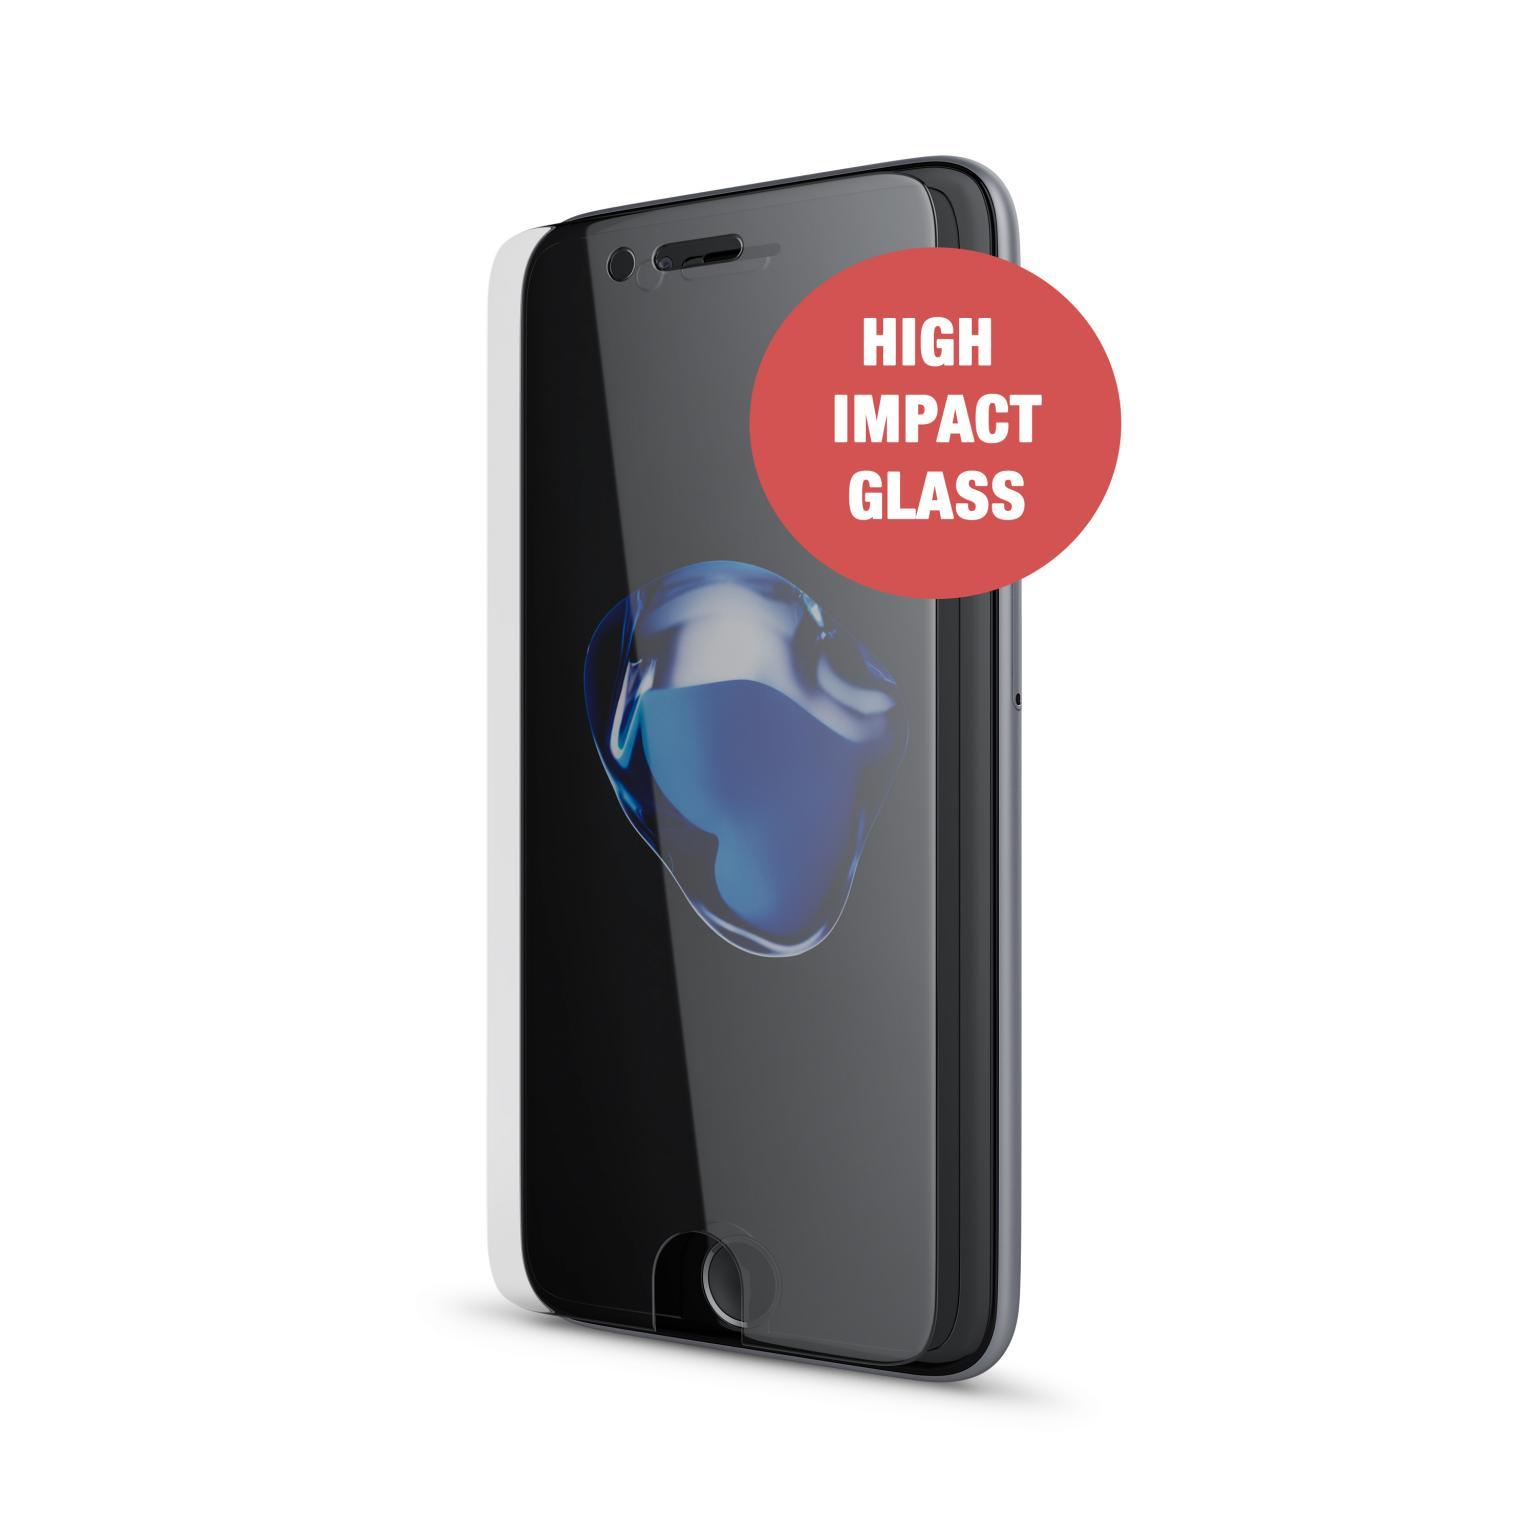 Afbeelding van BeHello iPhone 7 / 6S 6 High Impact Glass Transparent